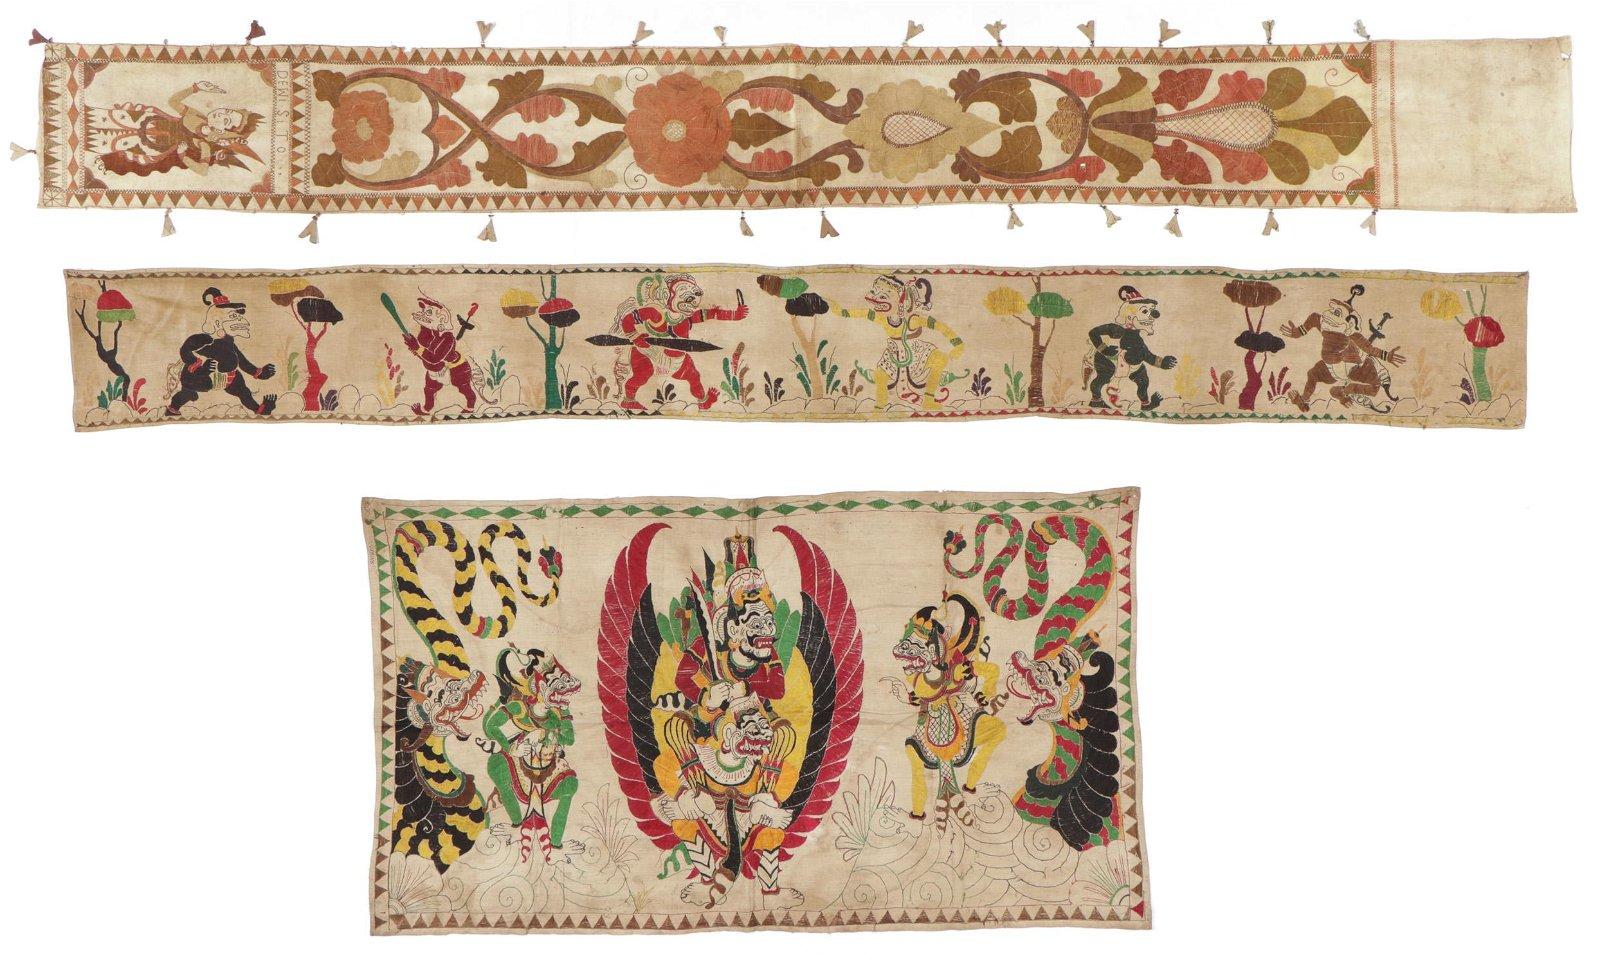 3 Balinese Ceremonial Temple Textiles